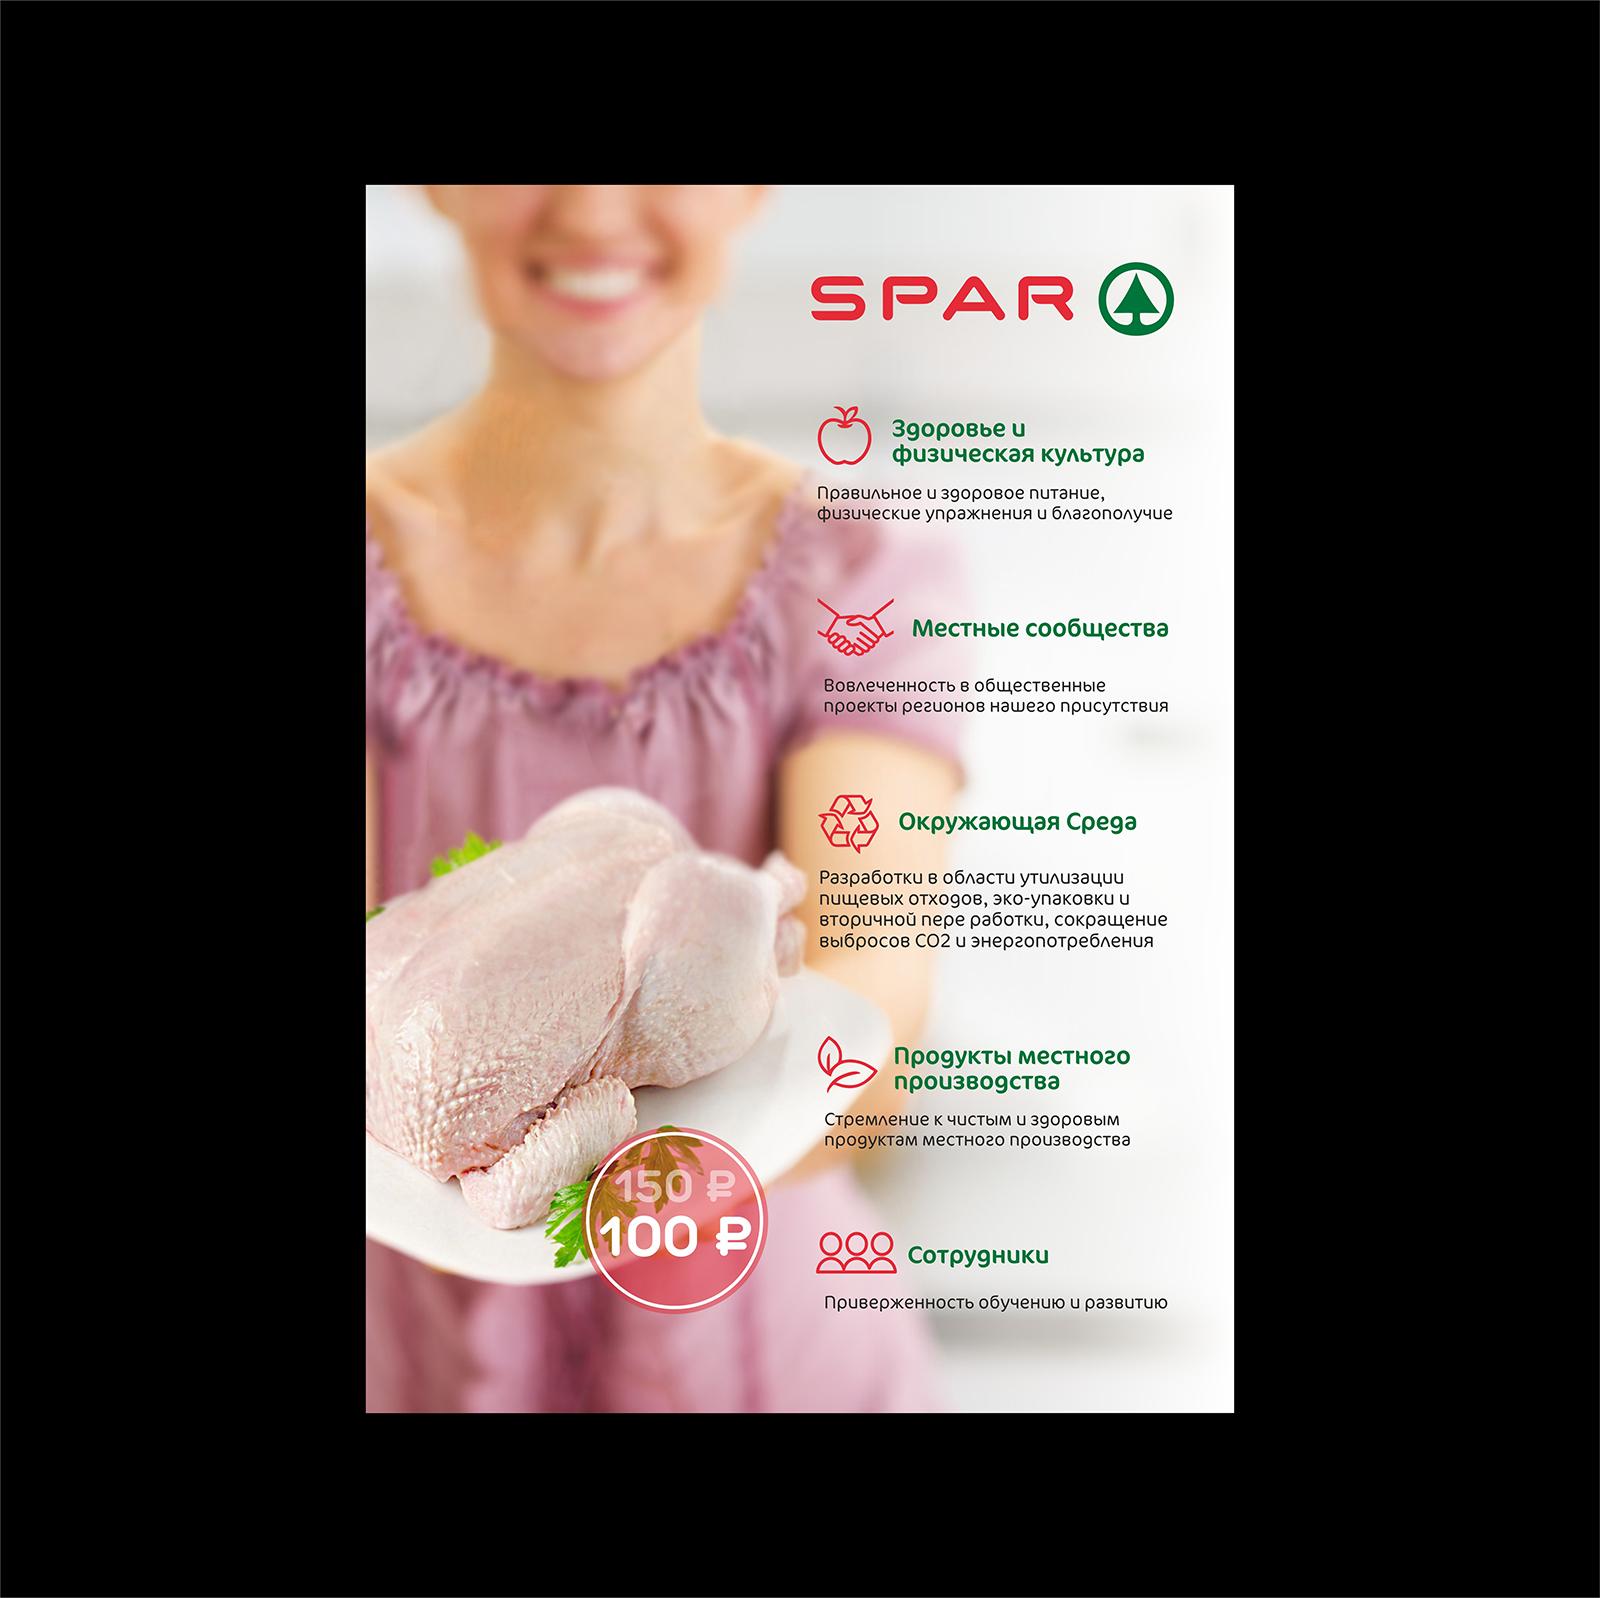 Дизайн листовки для магазина SPAR фото f_1625cb71e6ac4082.jpg